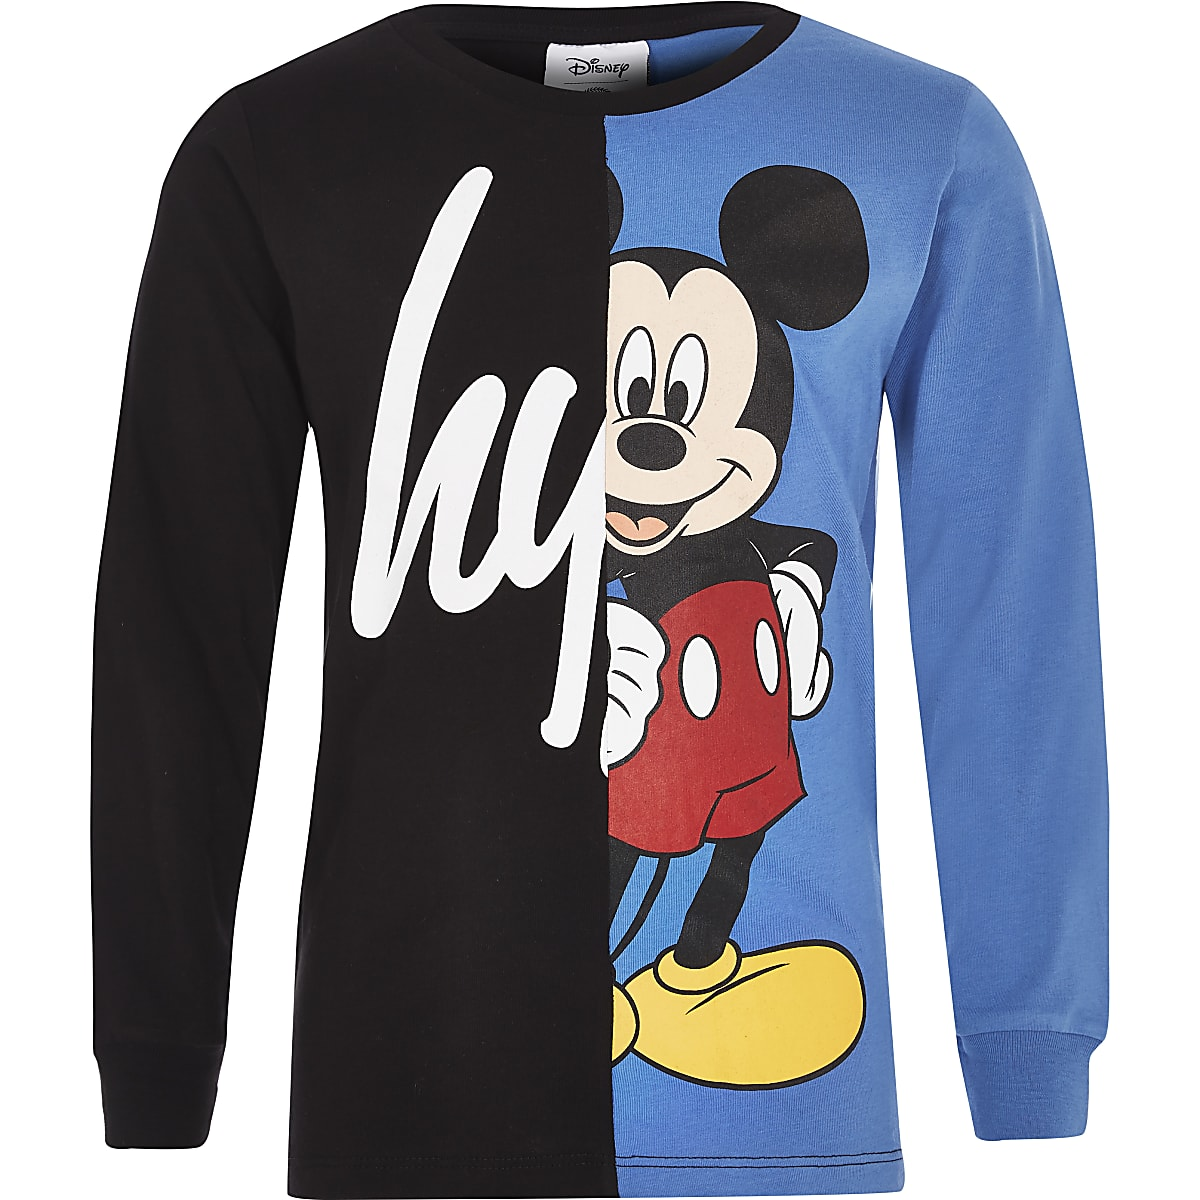 Boys Hype Disney black spliced T-shirt